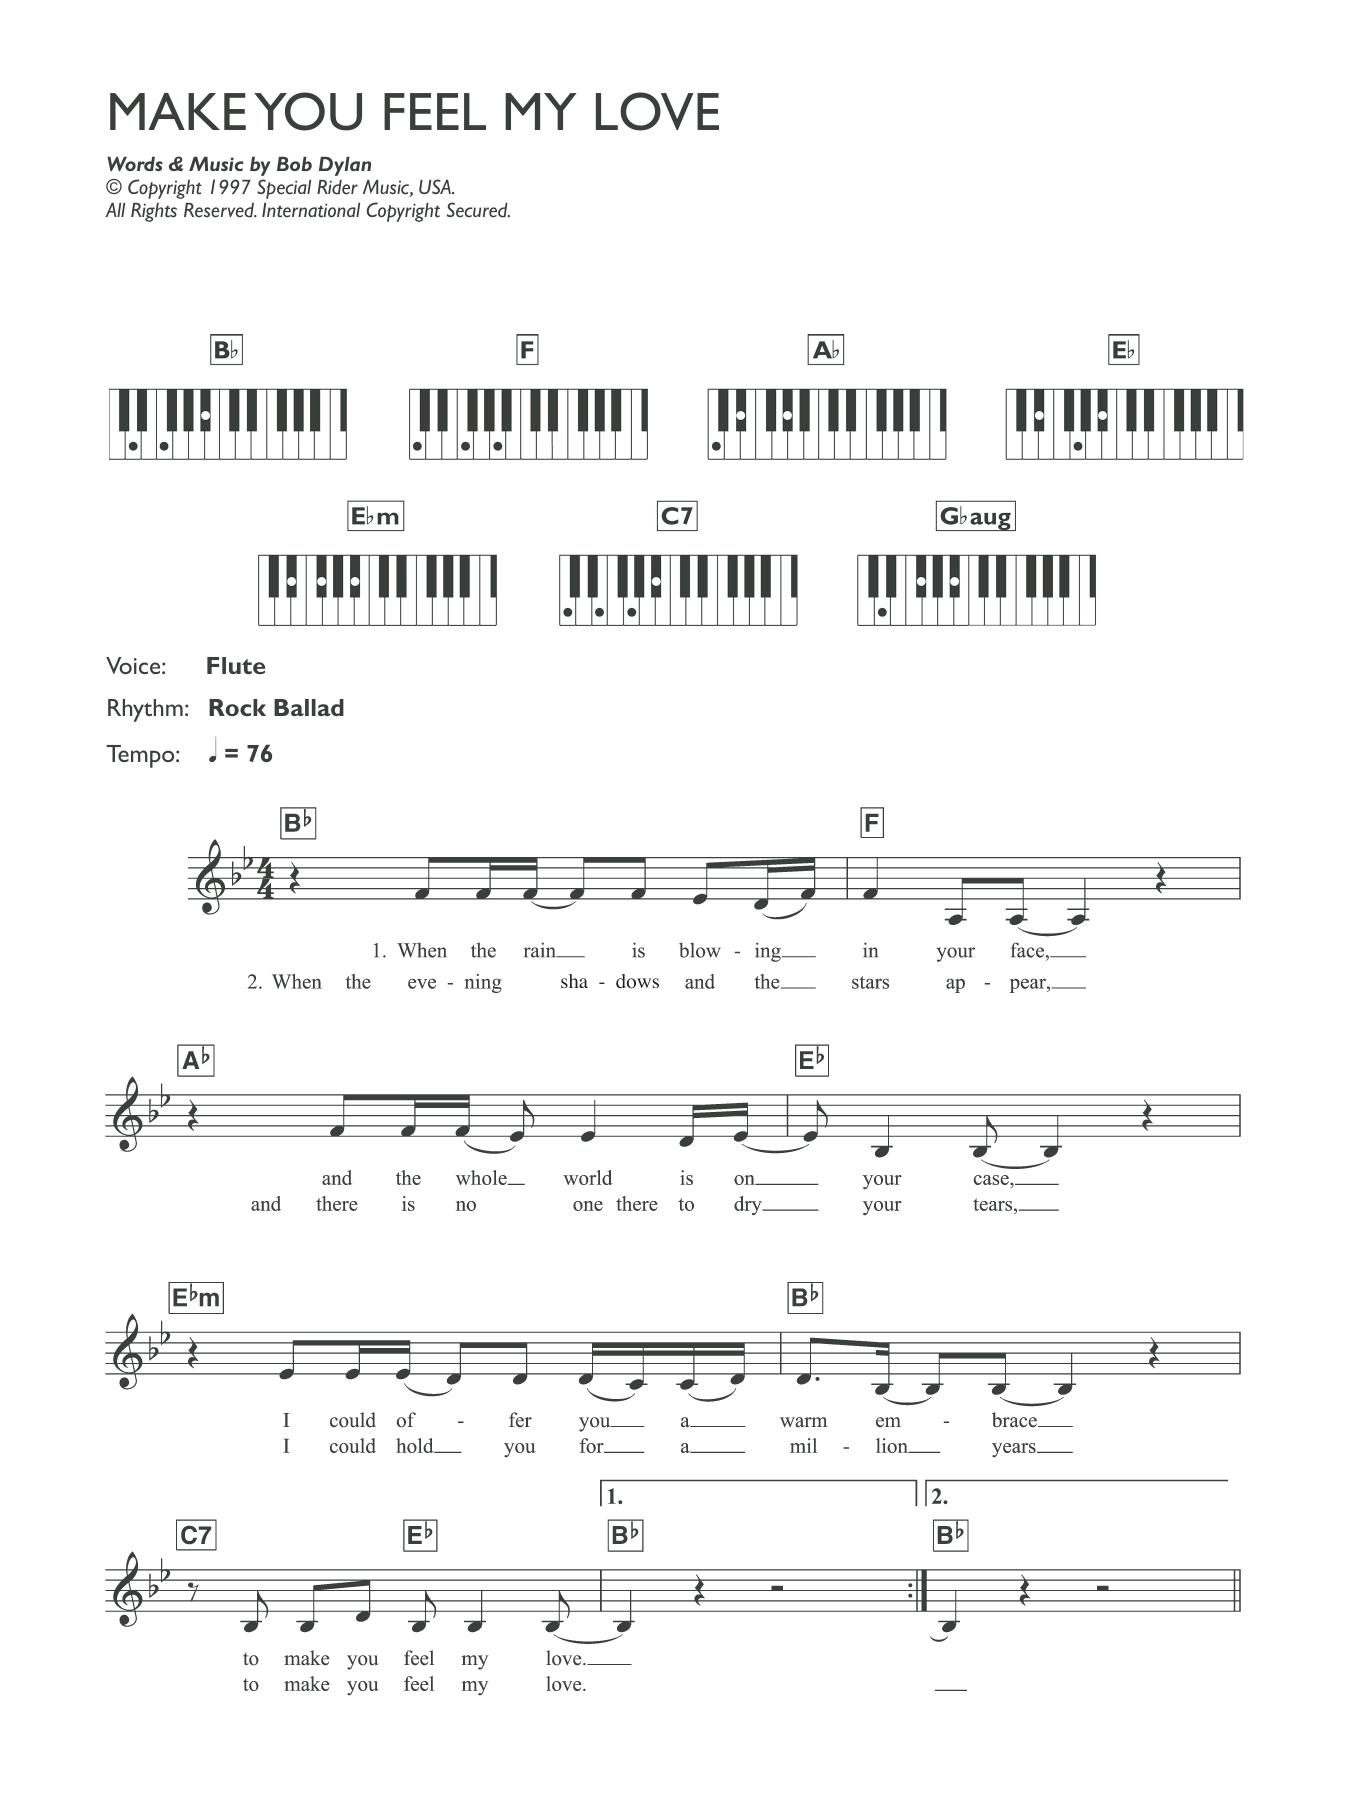 Make You Feel My Love Sheet Music | Adele | Piano Chords/Lyrics